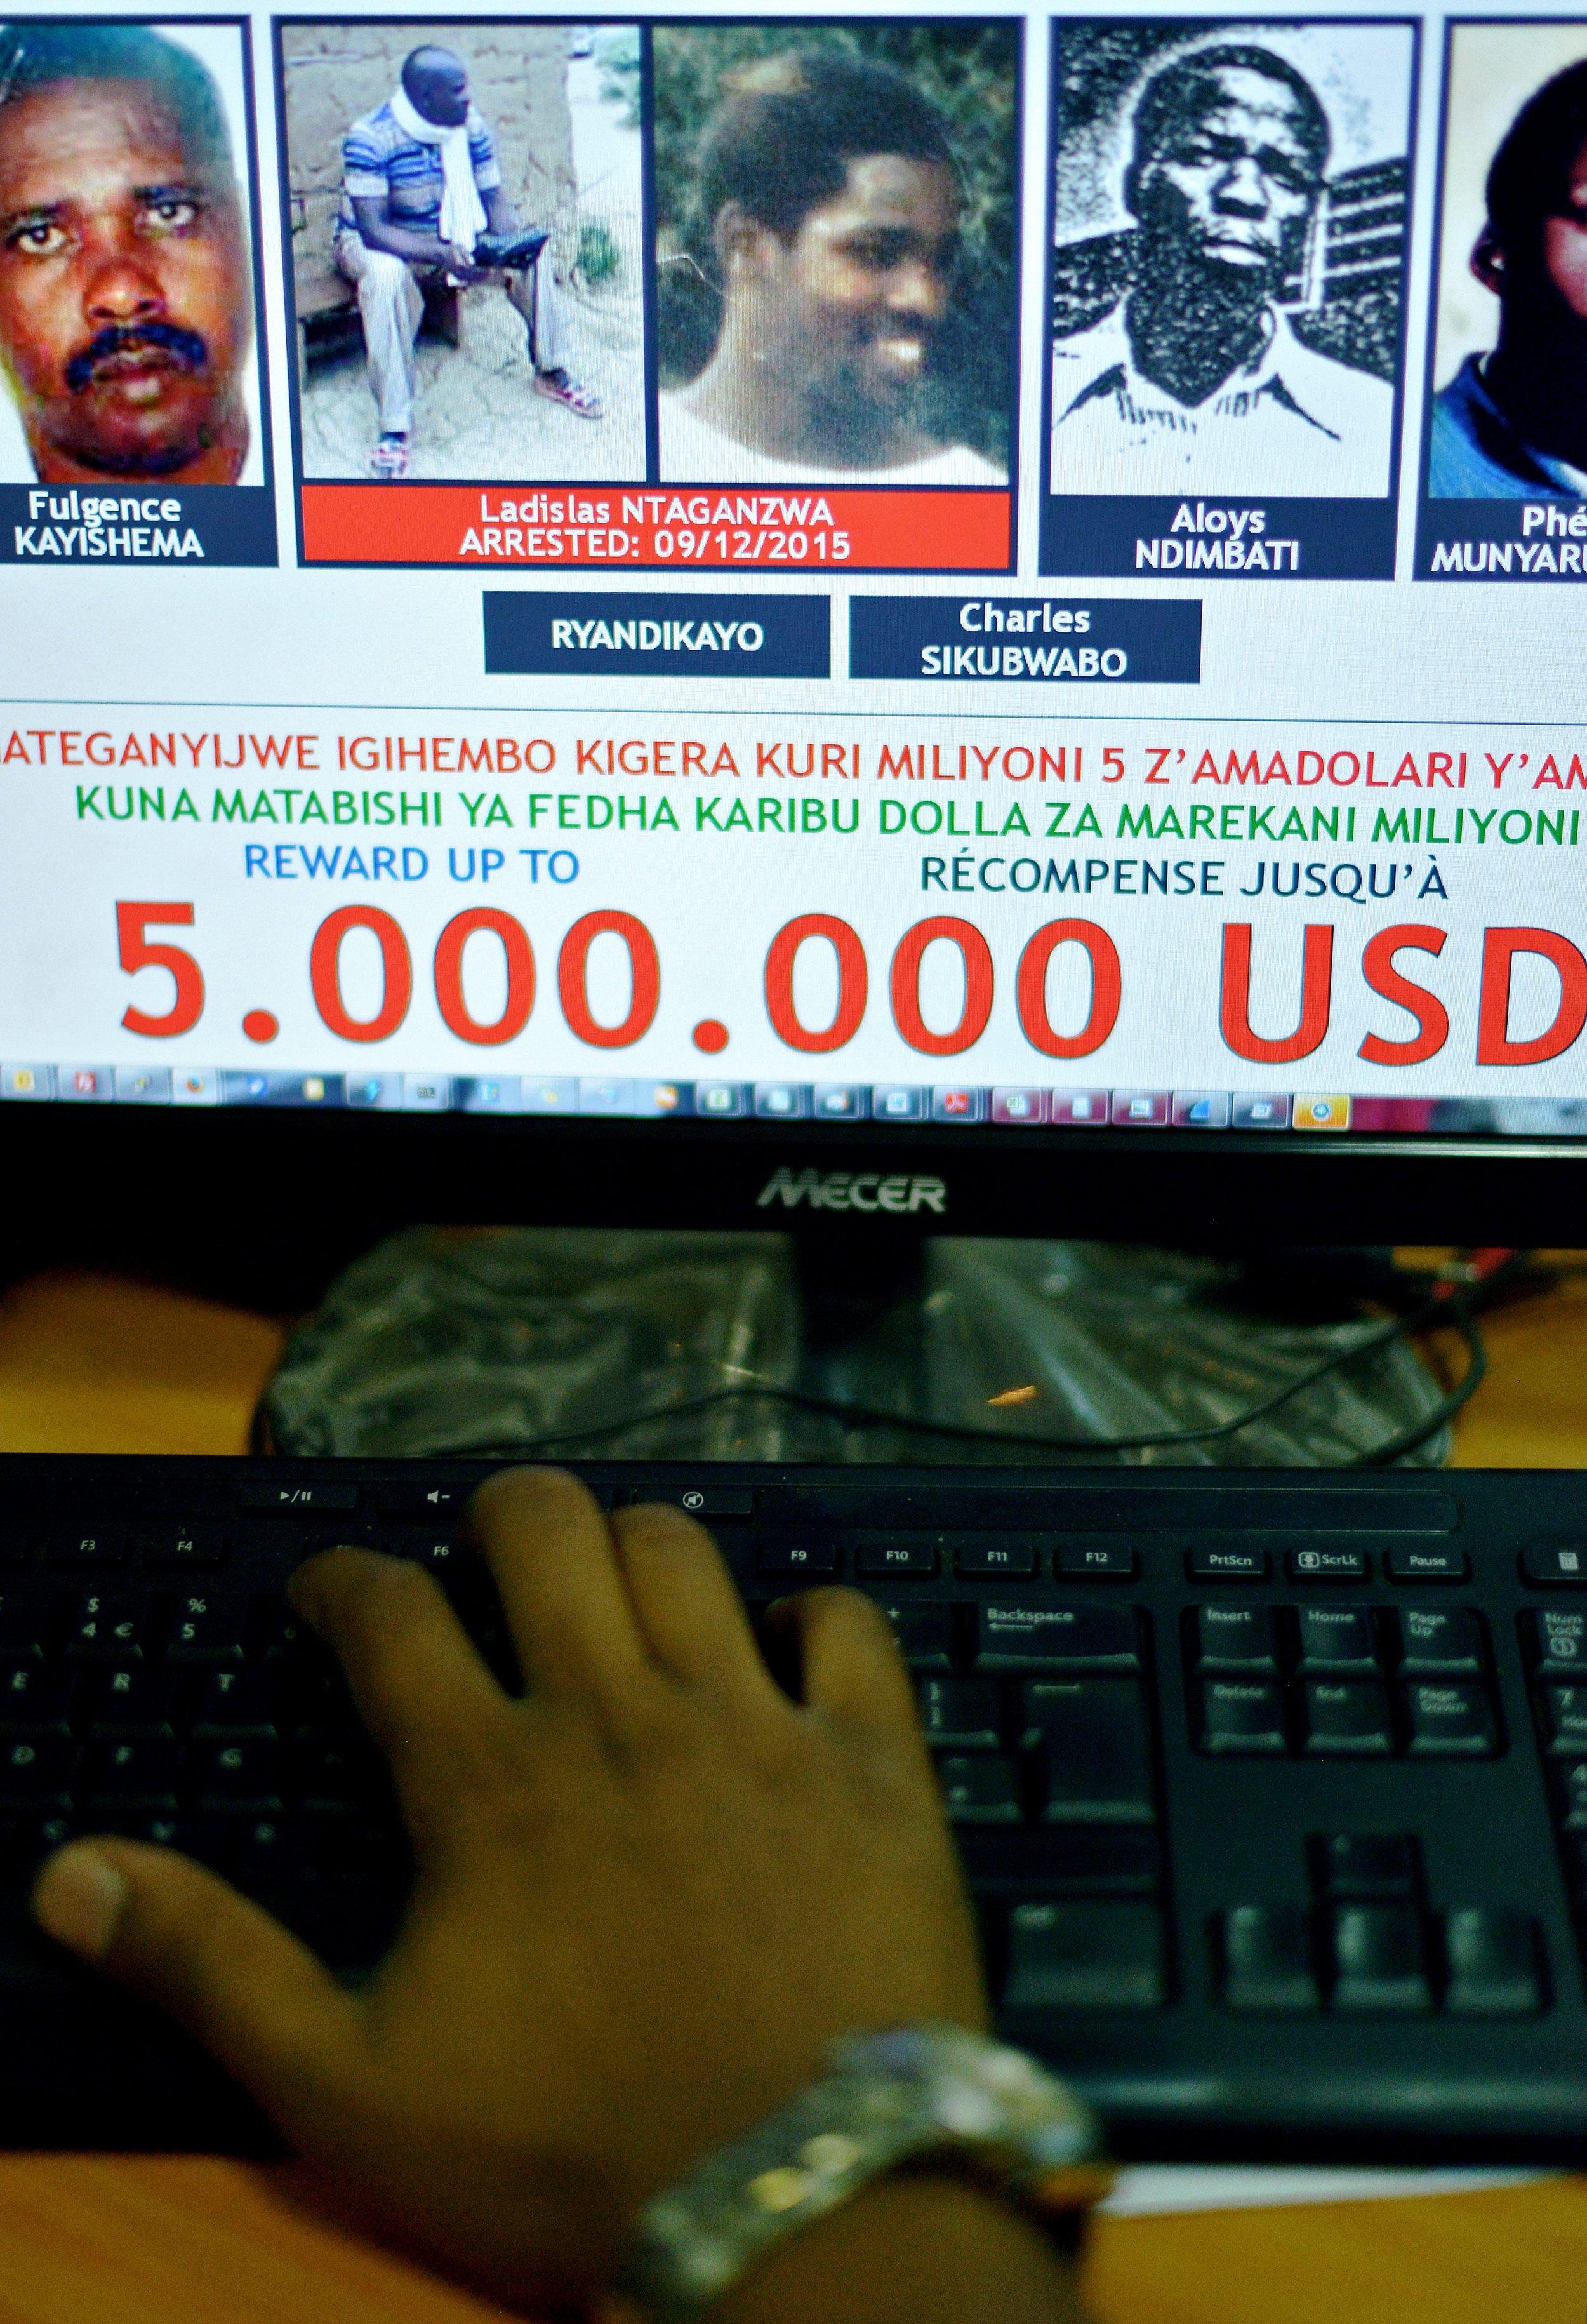 Ladislas Ntaganzwa is pictured on a U.N. website.